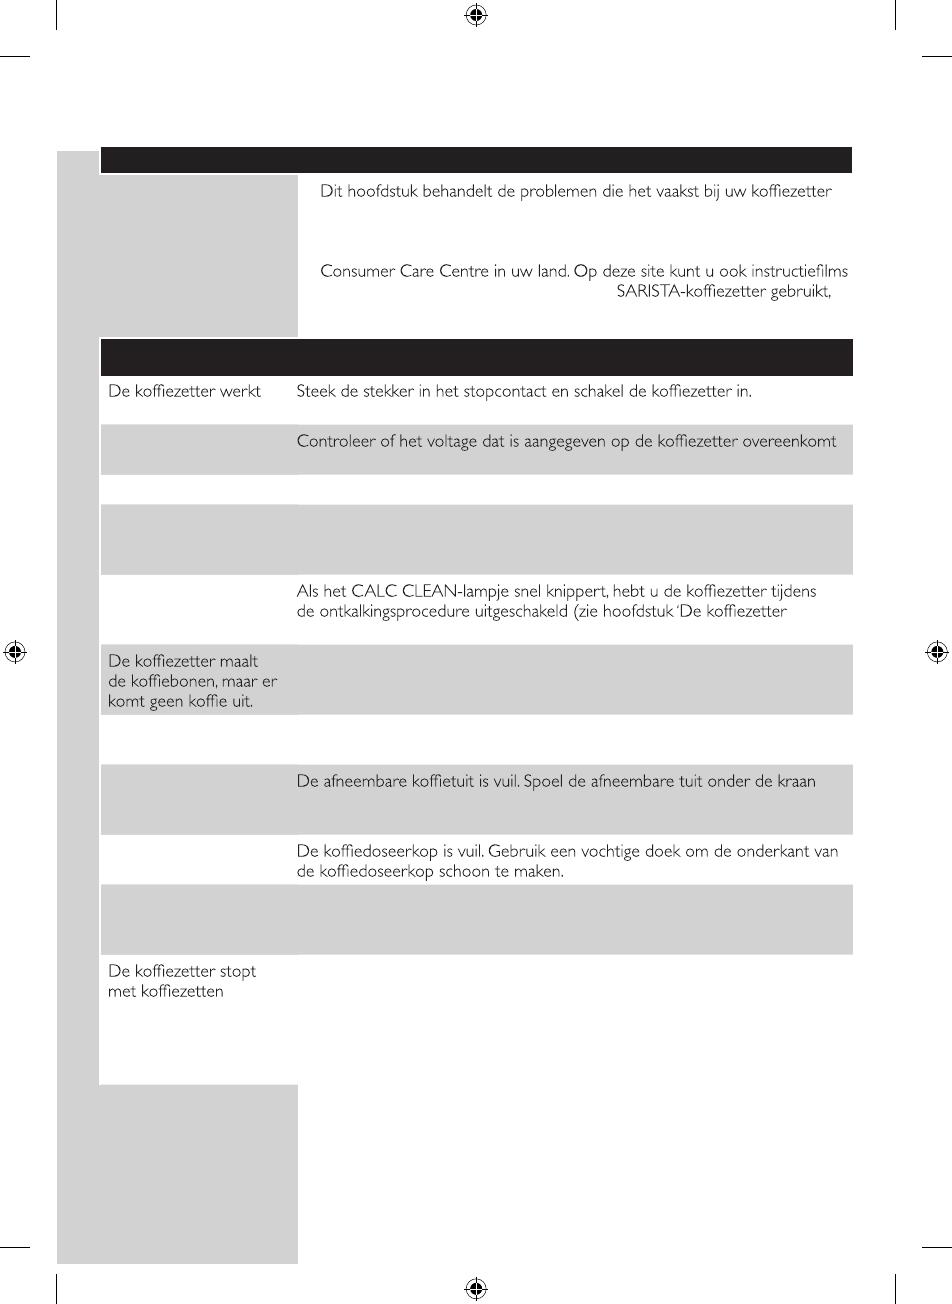 Spiksplinternieuw Handleiding Philips HD 8010 Senseo Sarista (pagina 1 van 92 QH-39